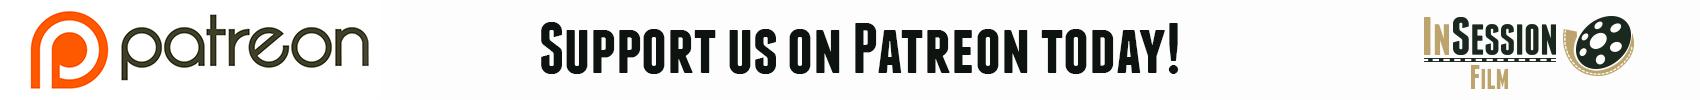 InSession-Film-Patreon